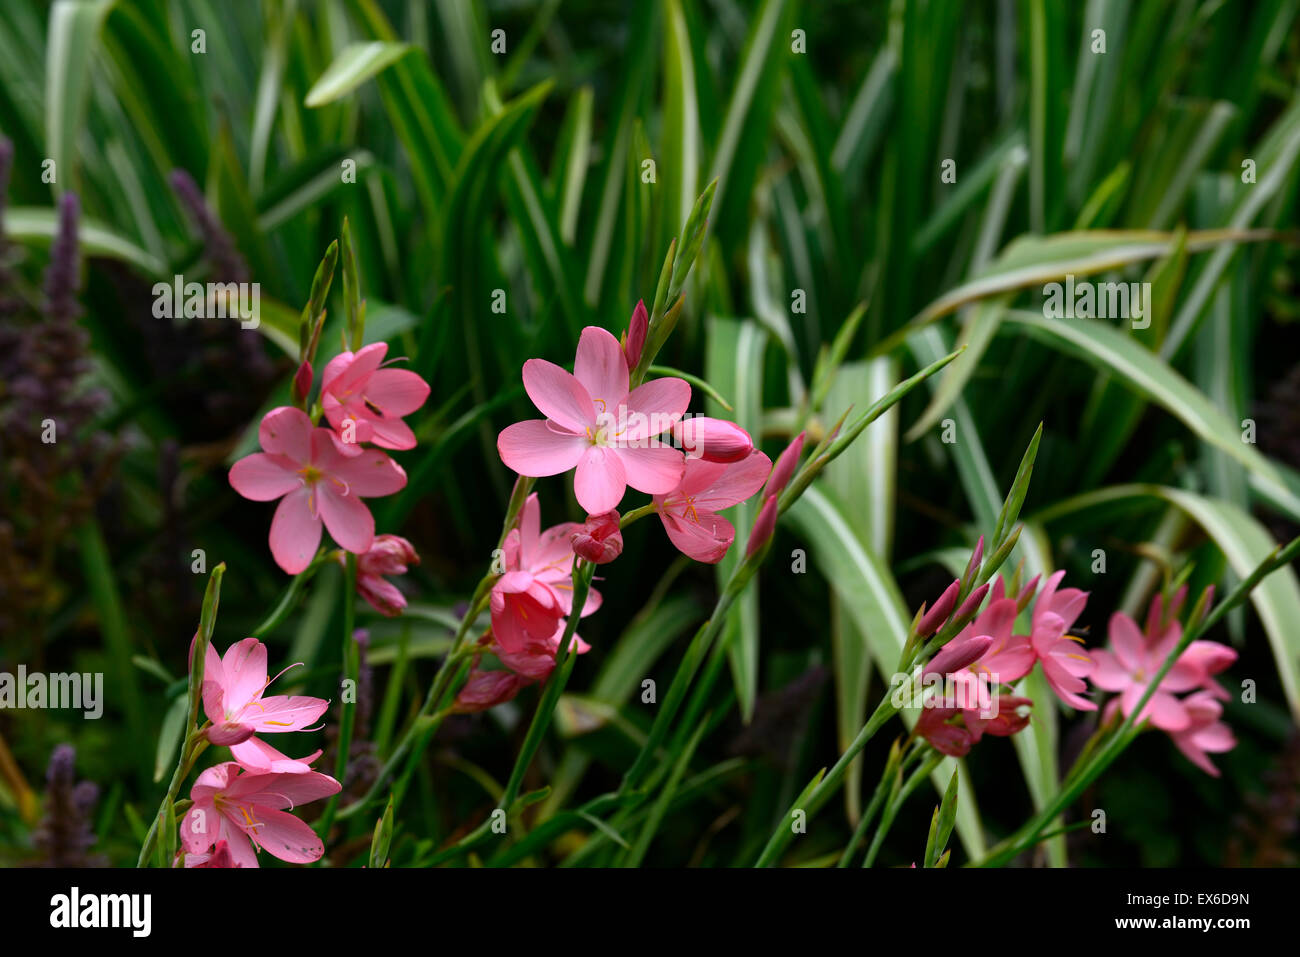 Hesperantha Schizostylis Coccinea Sunrise Pink Flower Flowers Stock